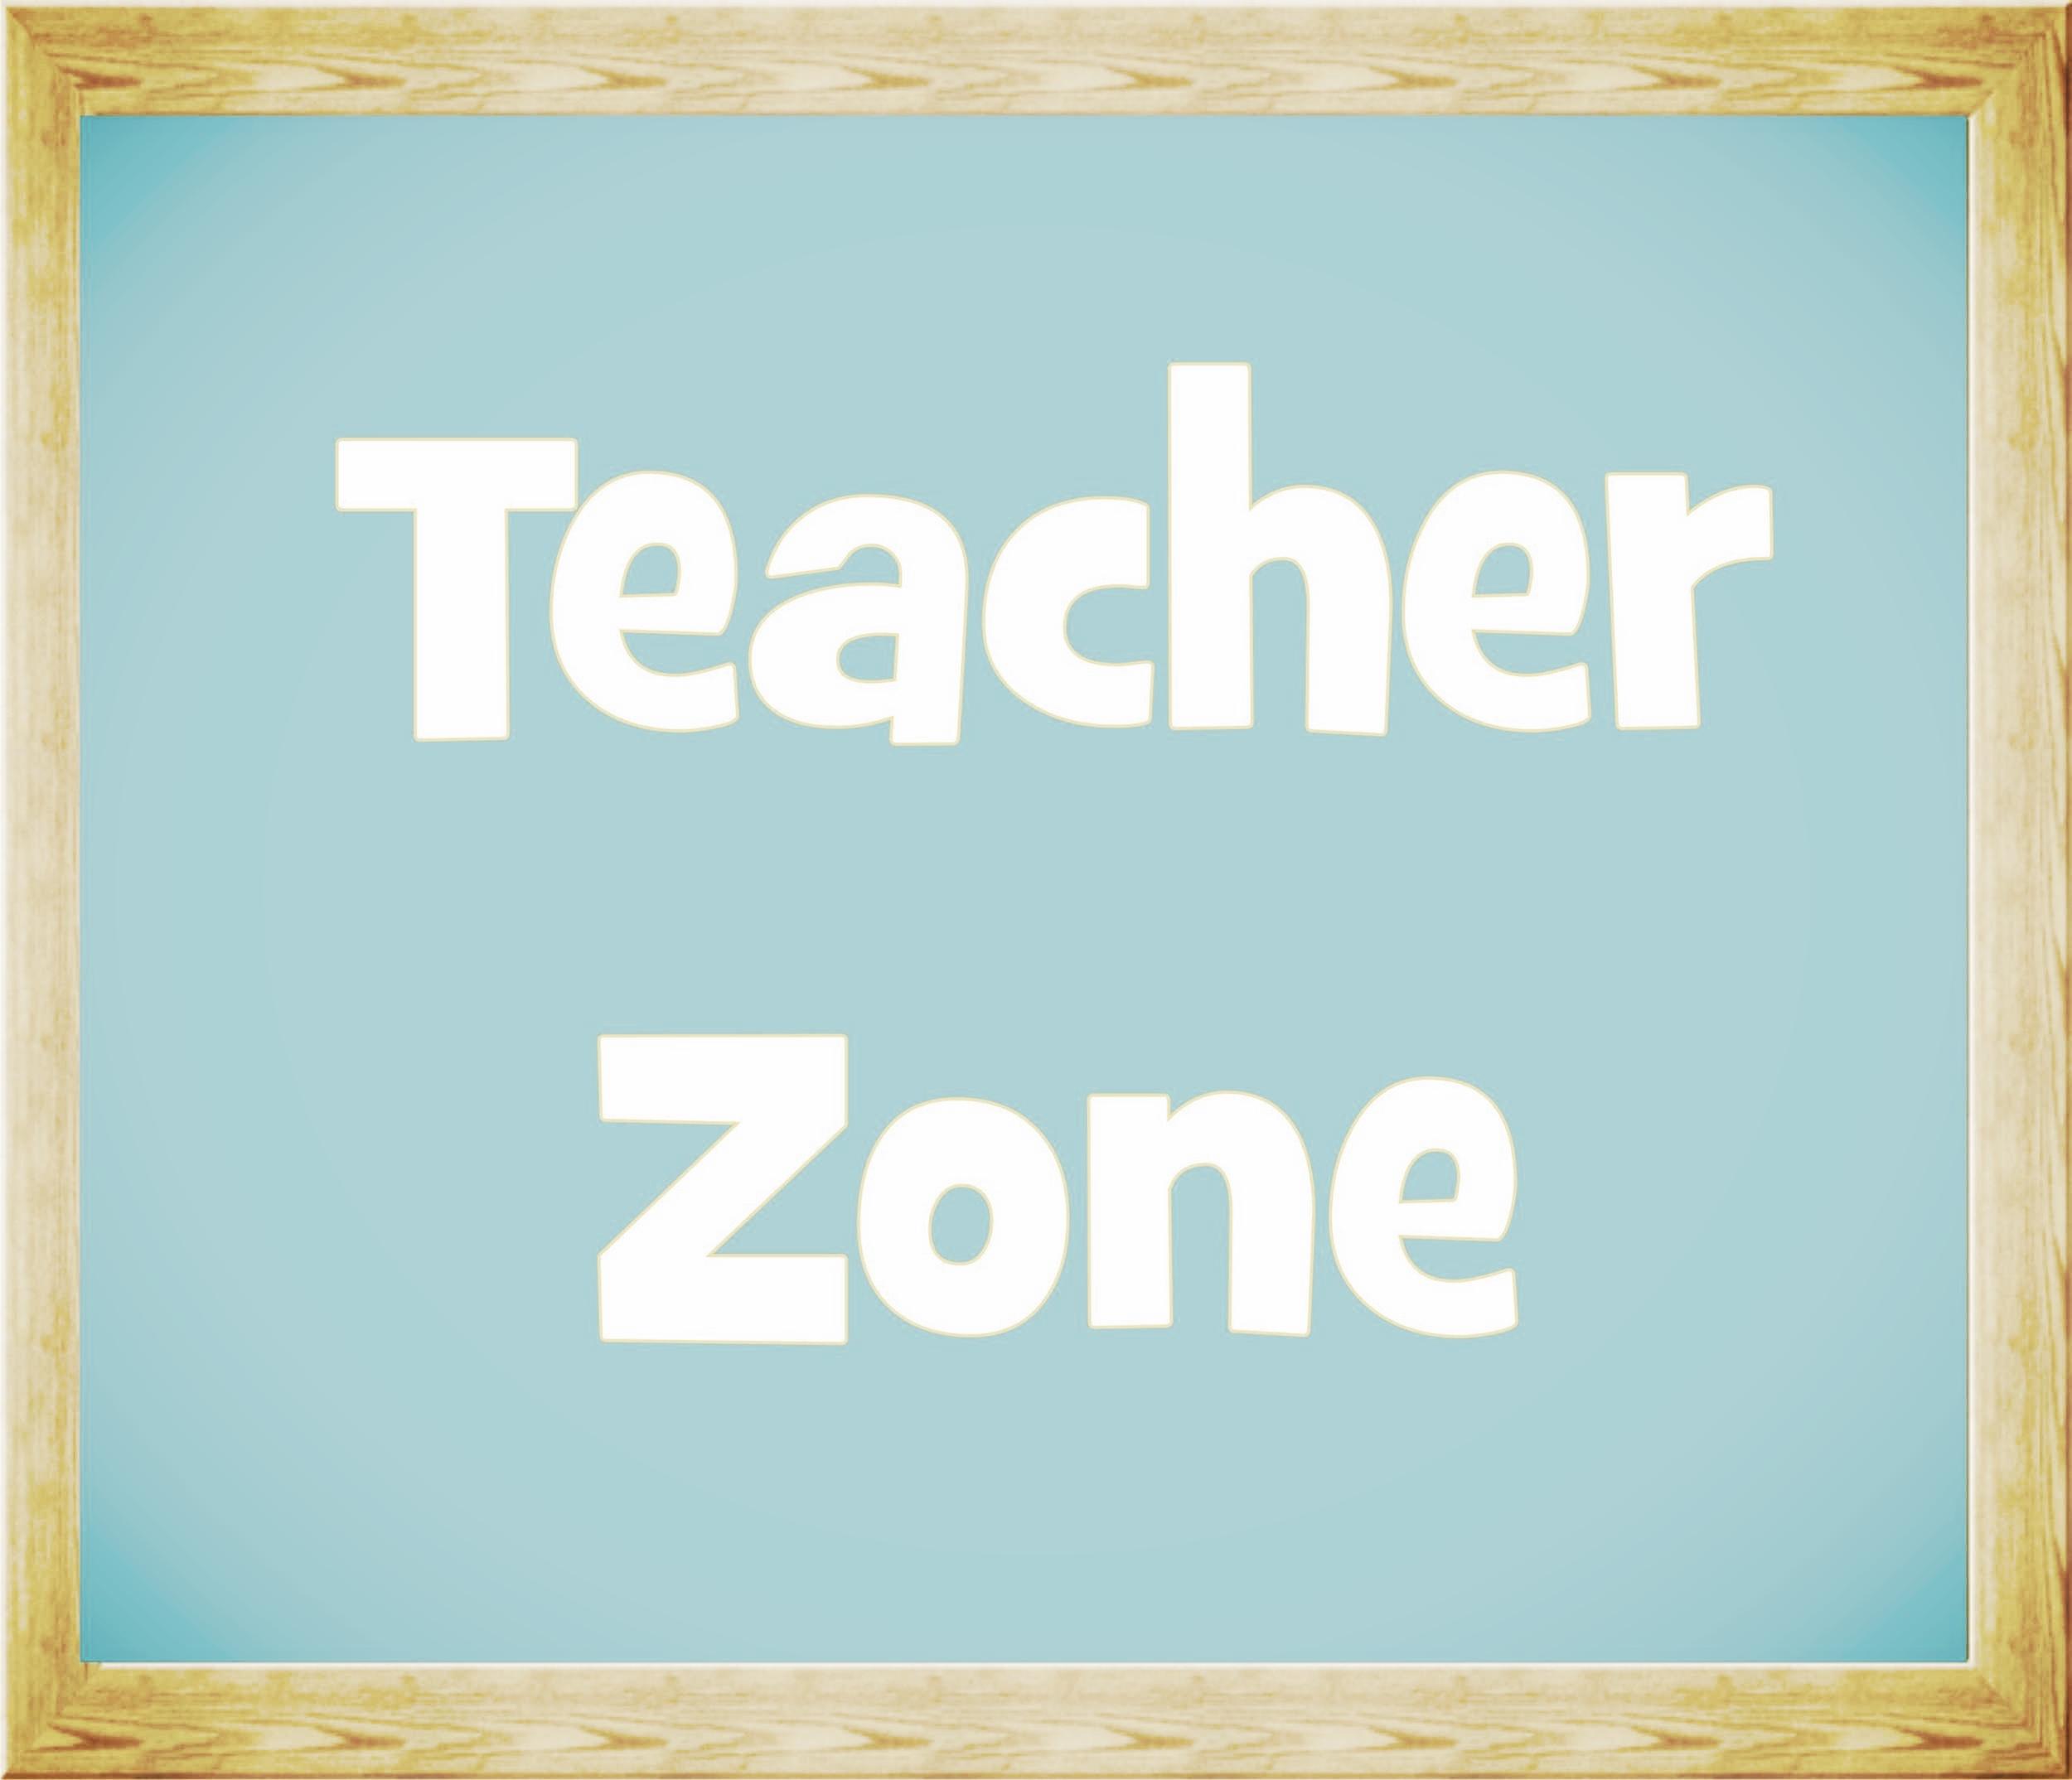 Teacher Zone 1 Thumbnail Graphic.jpg